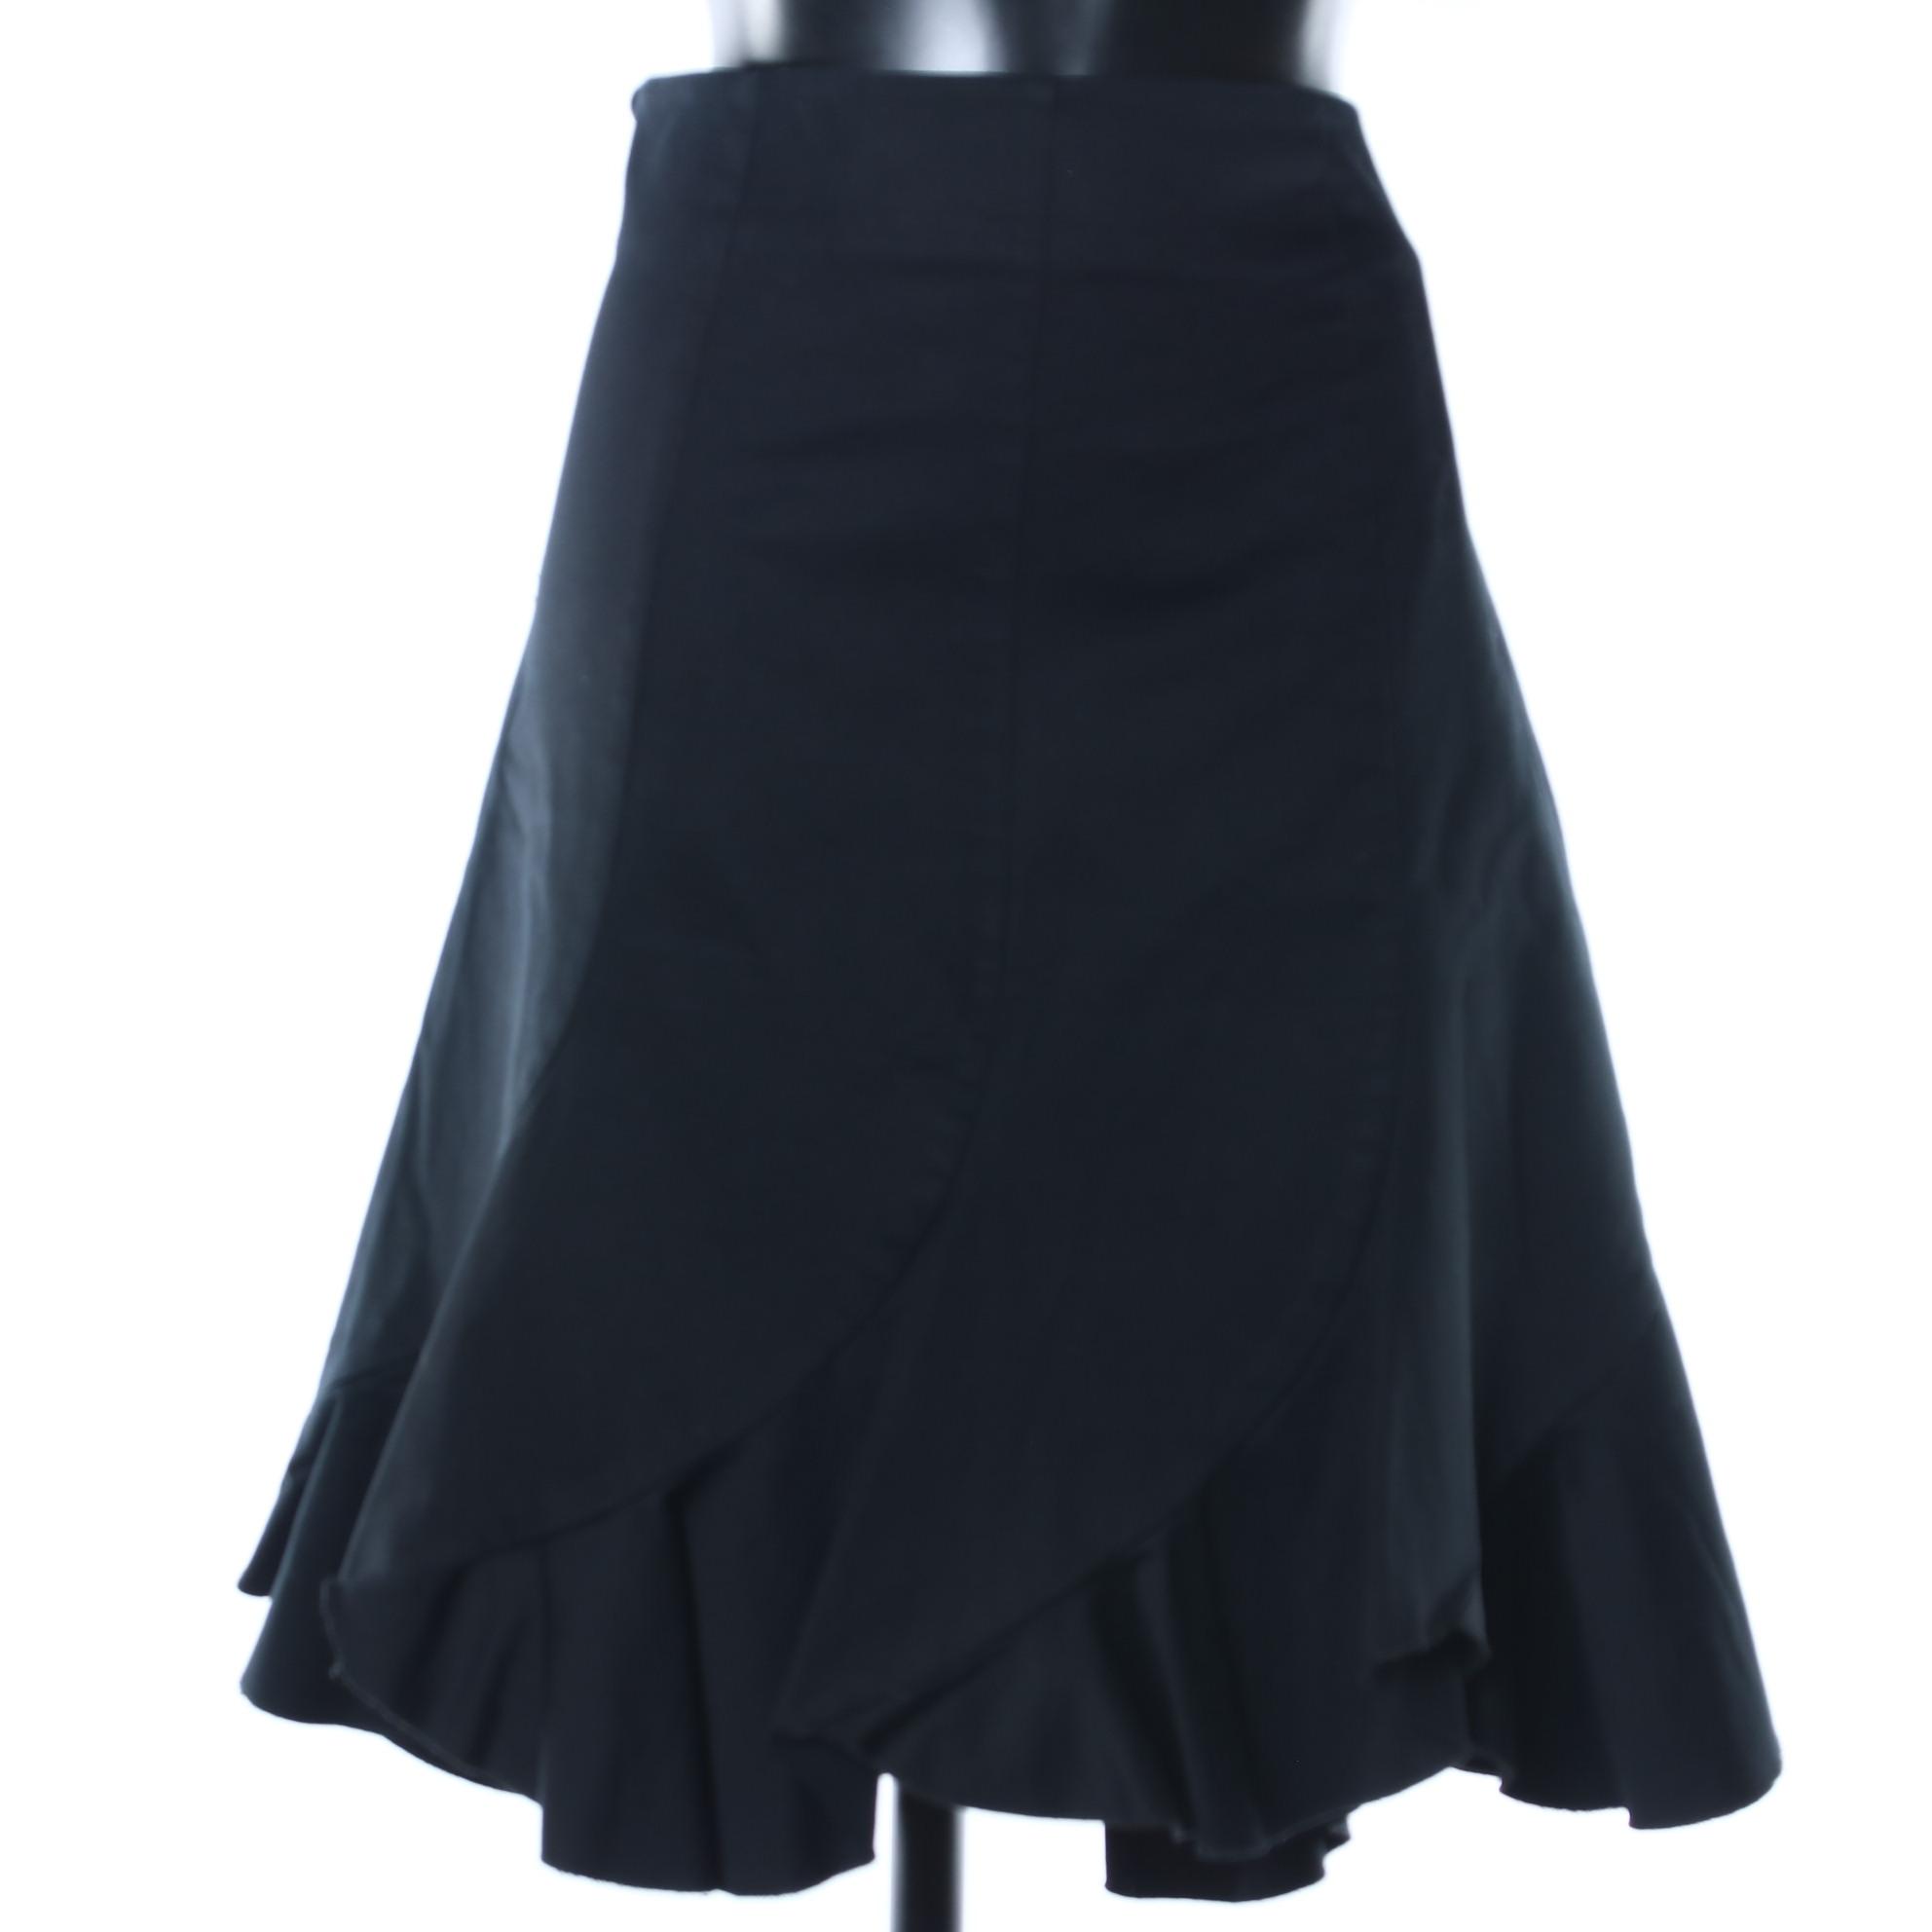 2252d1efef1a Soaked in luxery svart kjol L - Secondhand.se